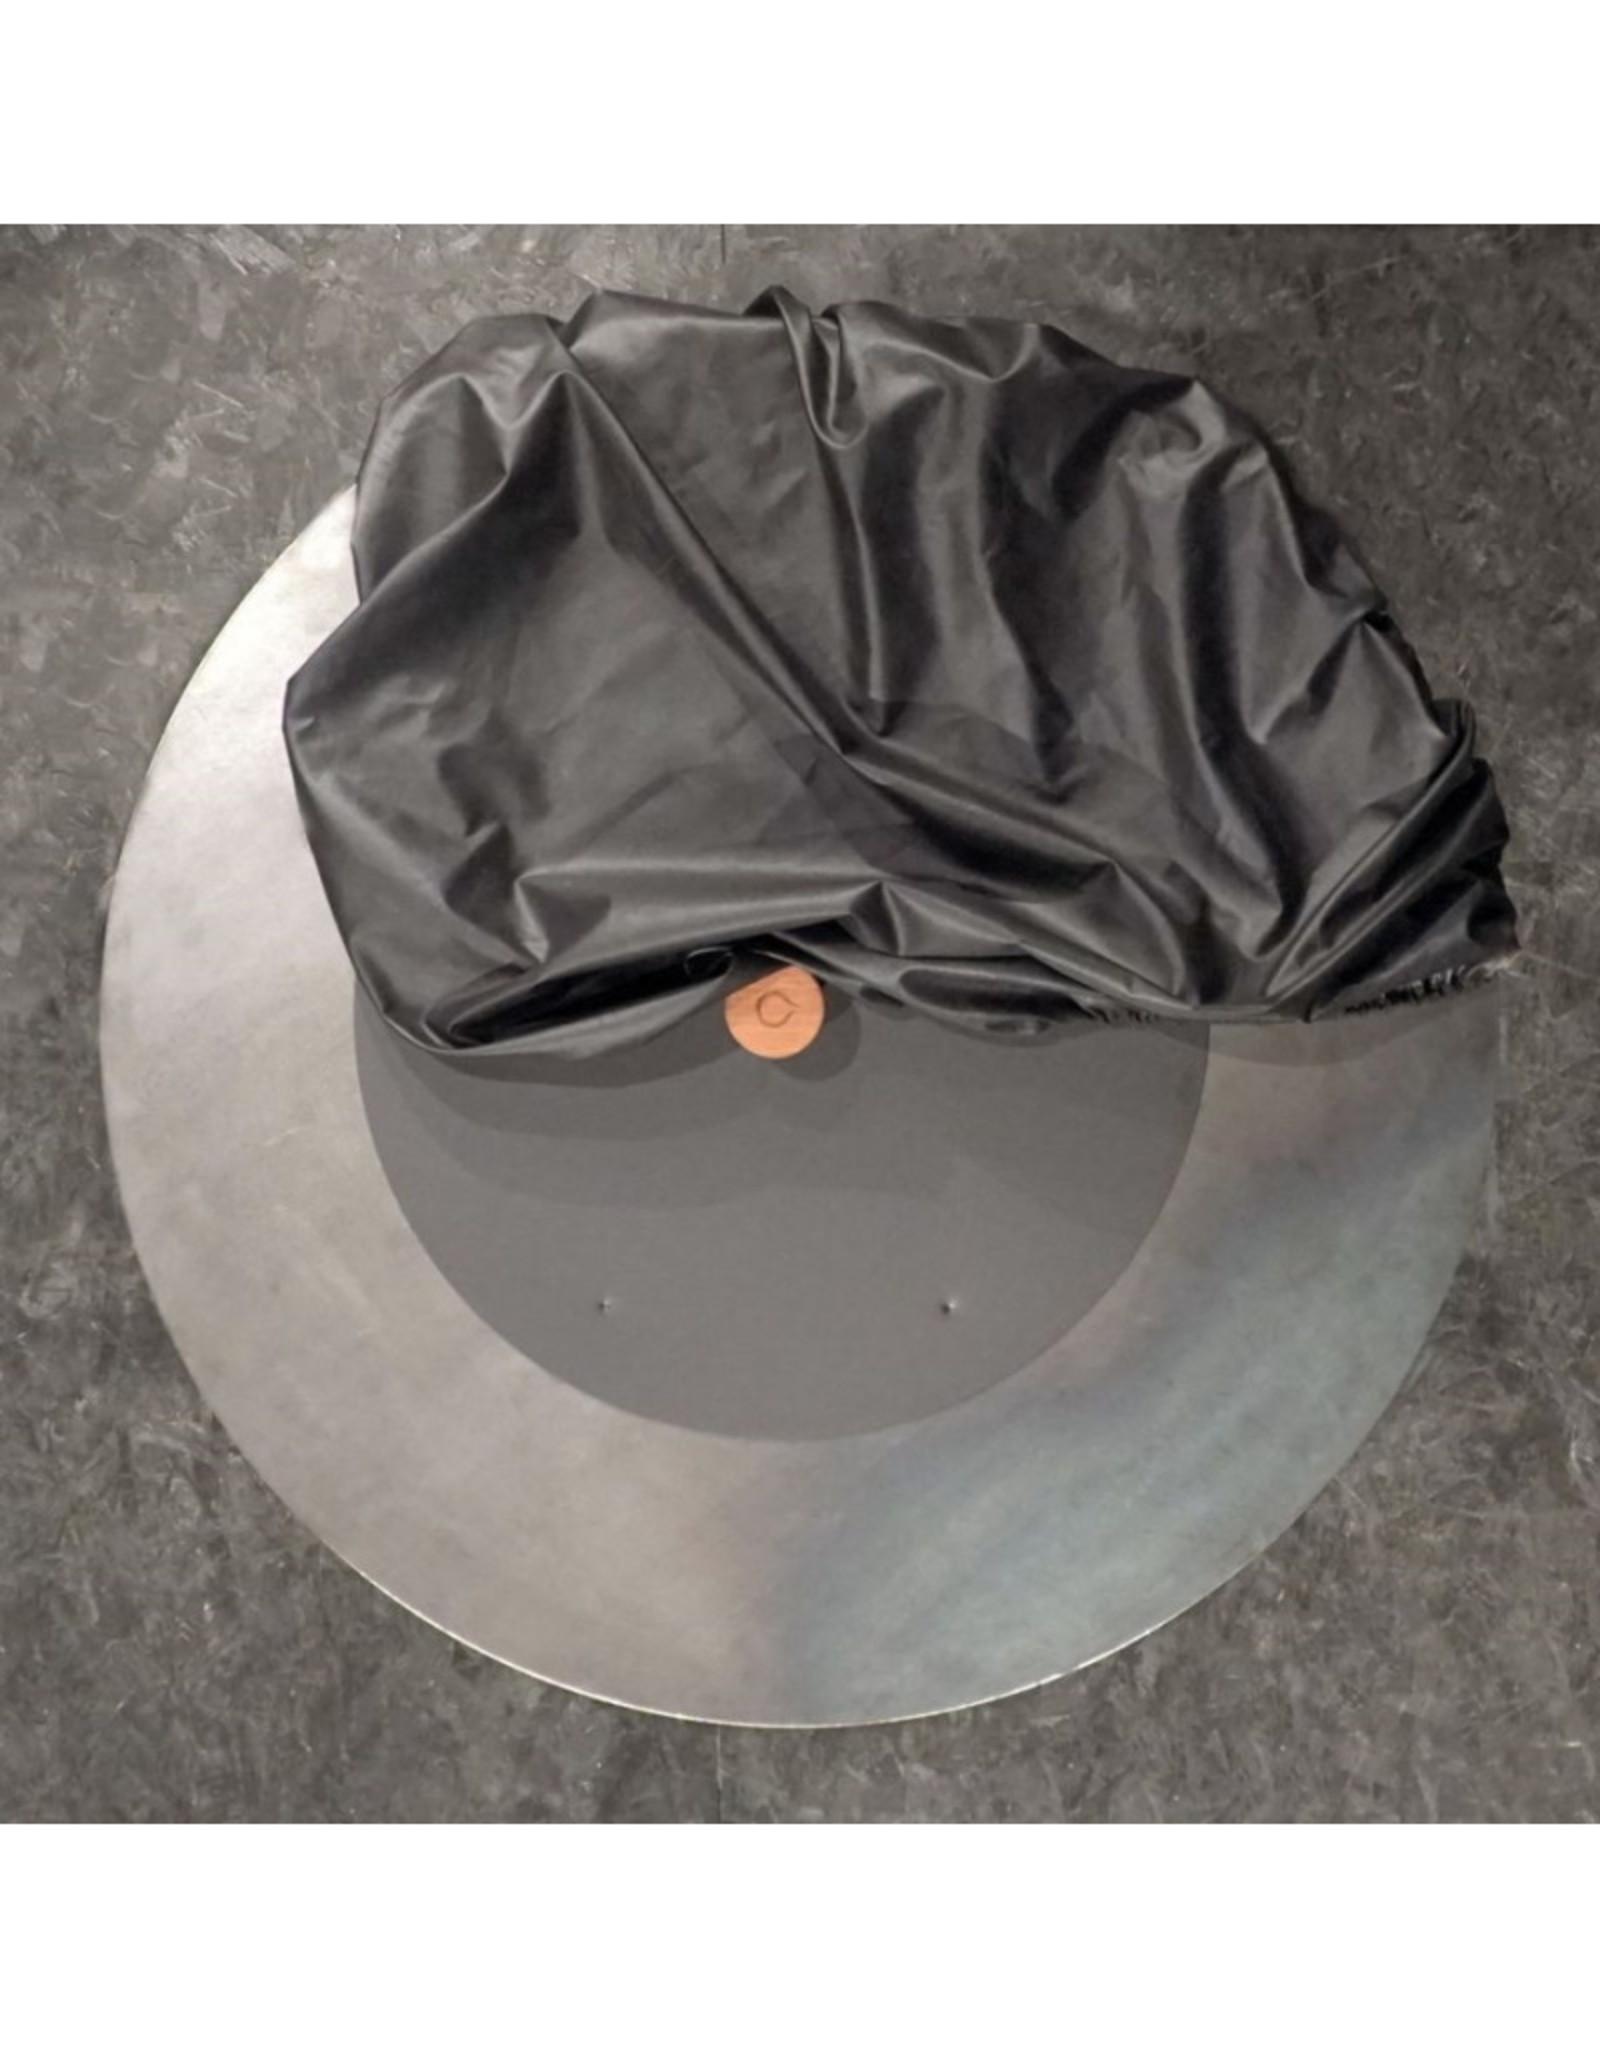 OFYR Doofdeksel Zwart en Afdekhoes Zwart Set XL